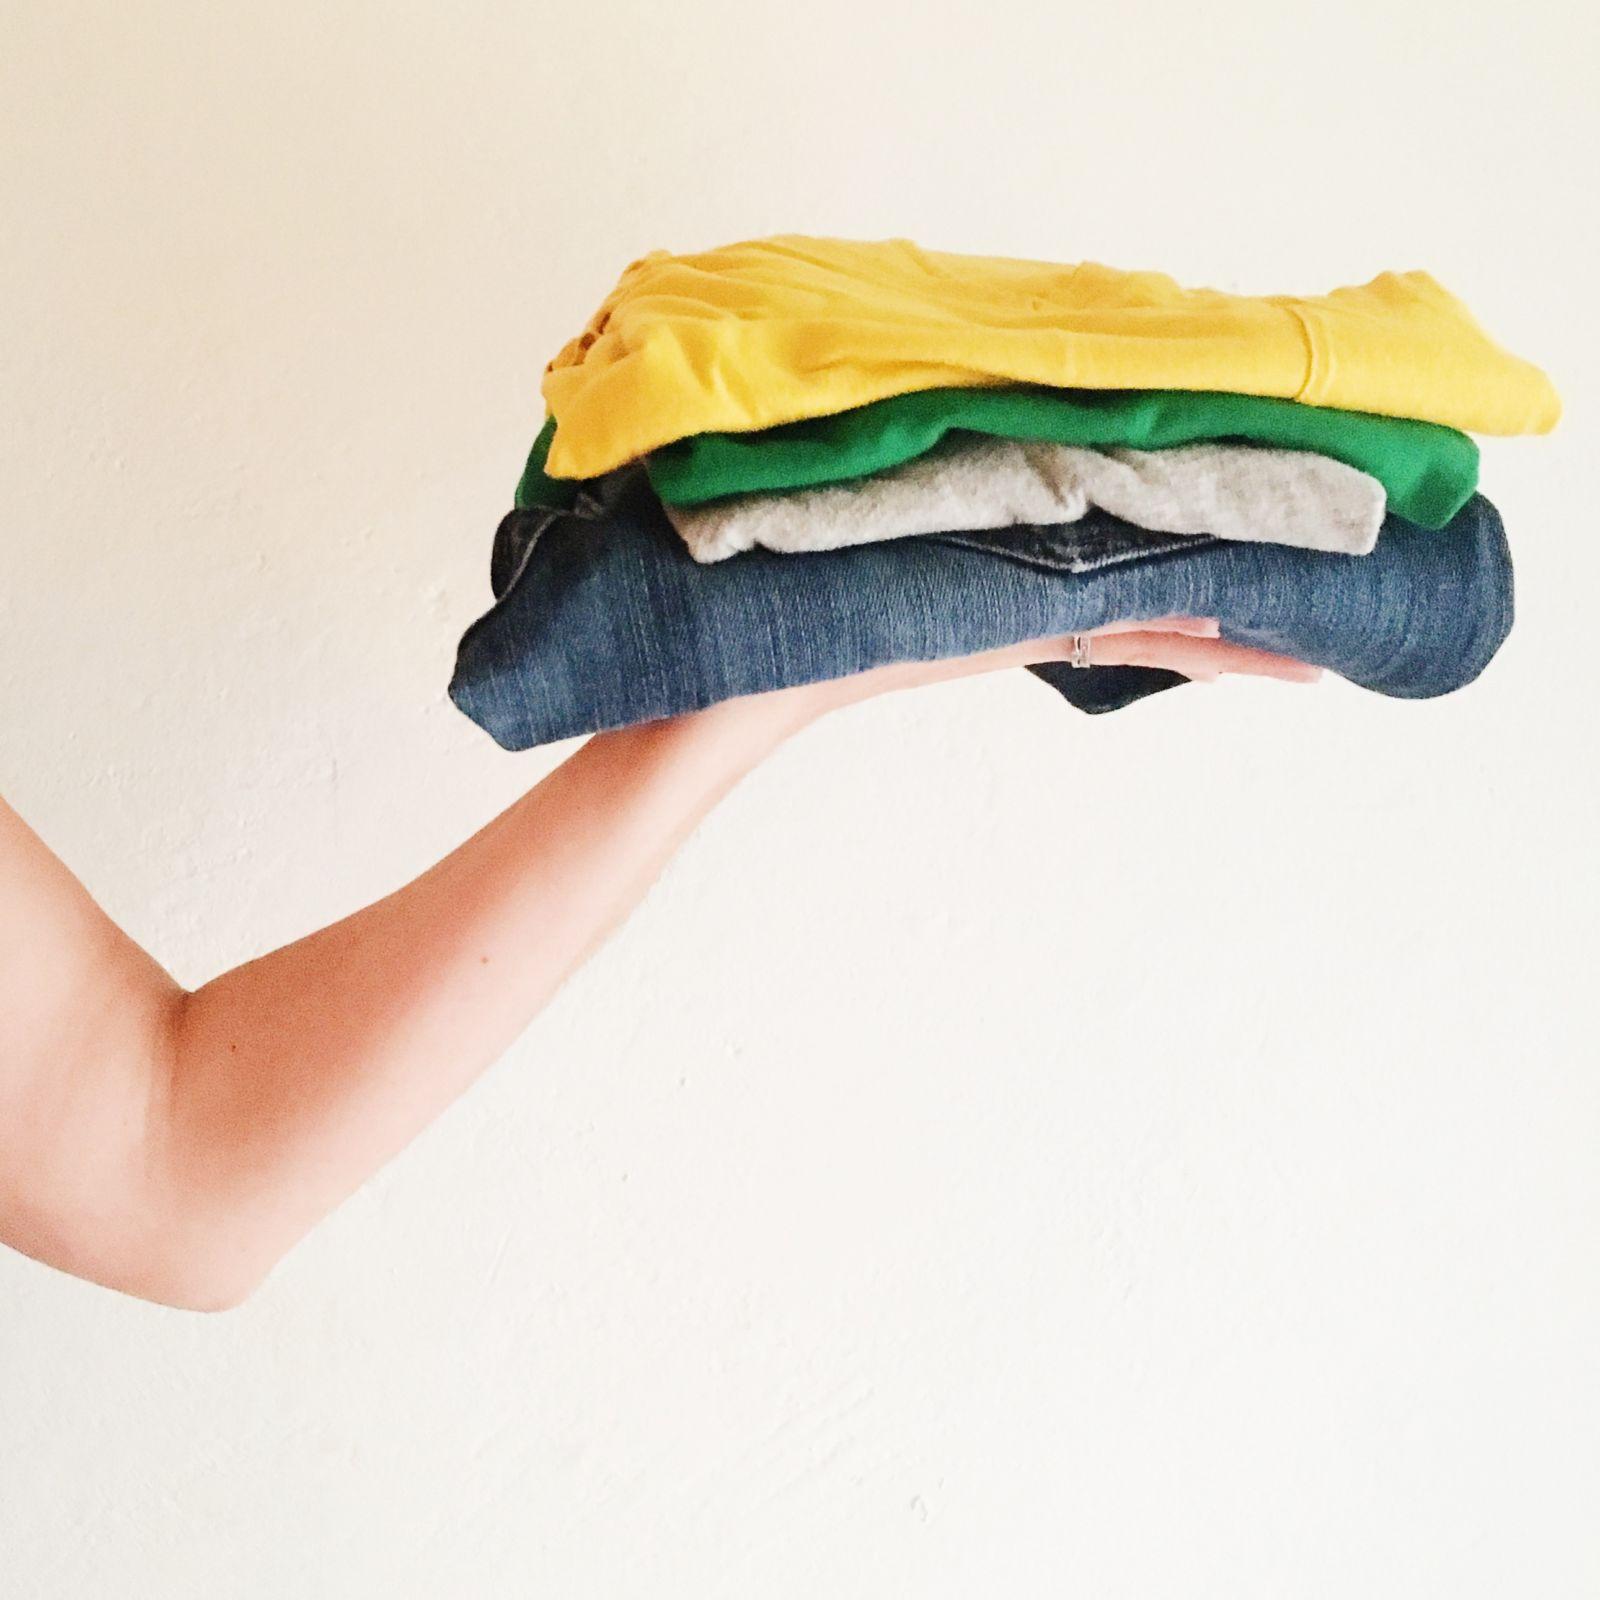 5-ways-to-simplify-your-wardrobe